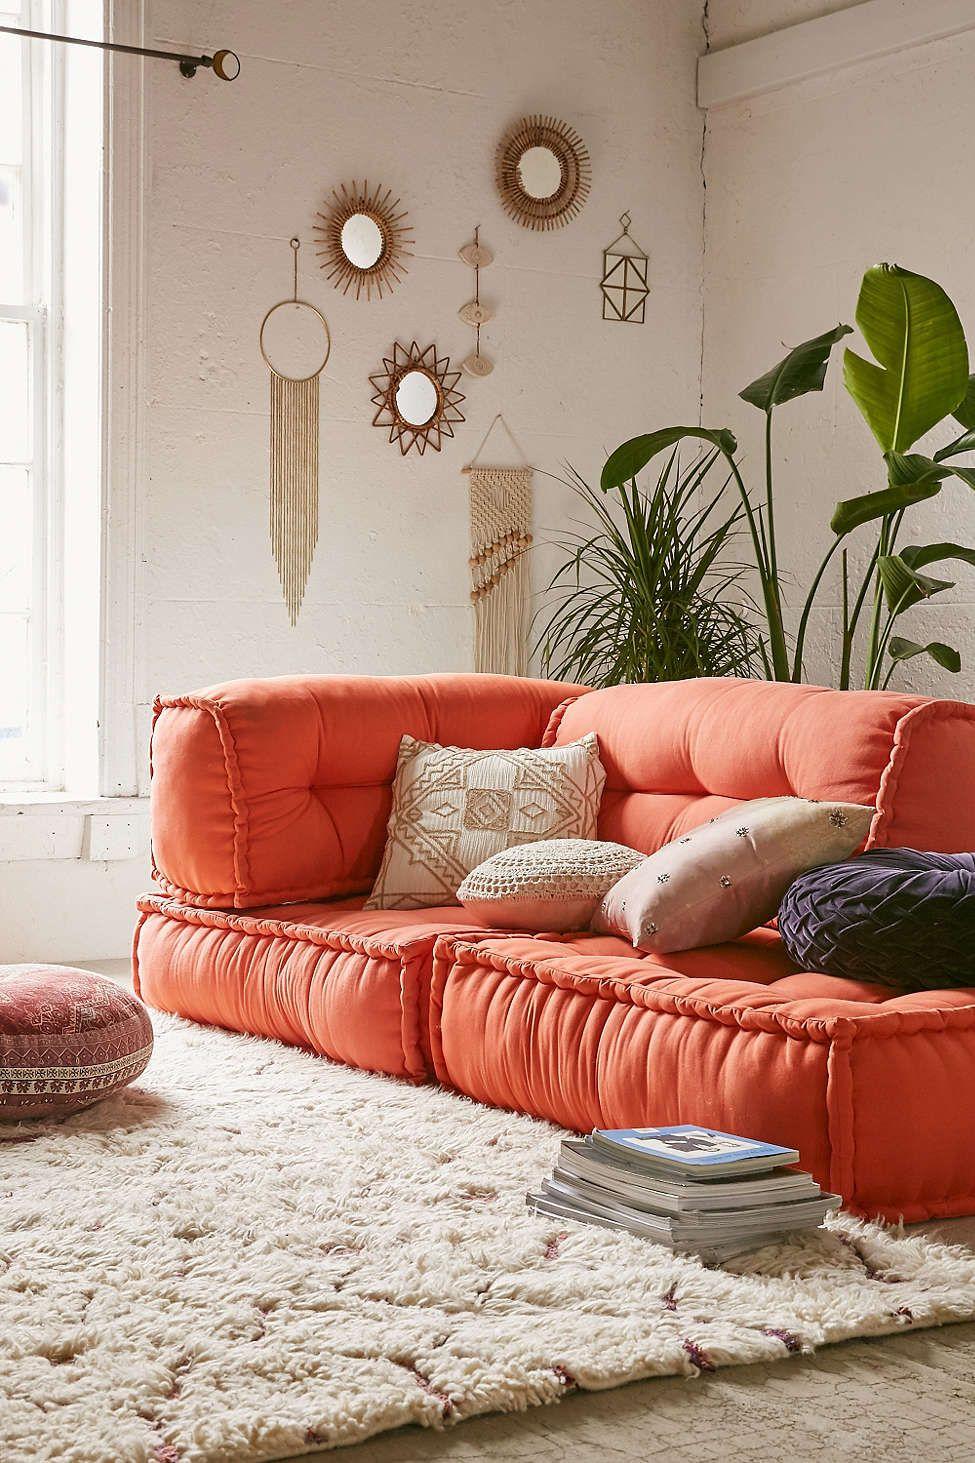 Reema Floor Cushion インテリア 家具 居間 インテリア ベッド